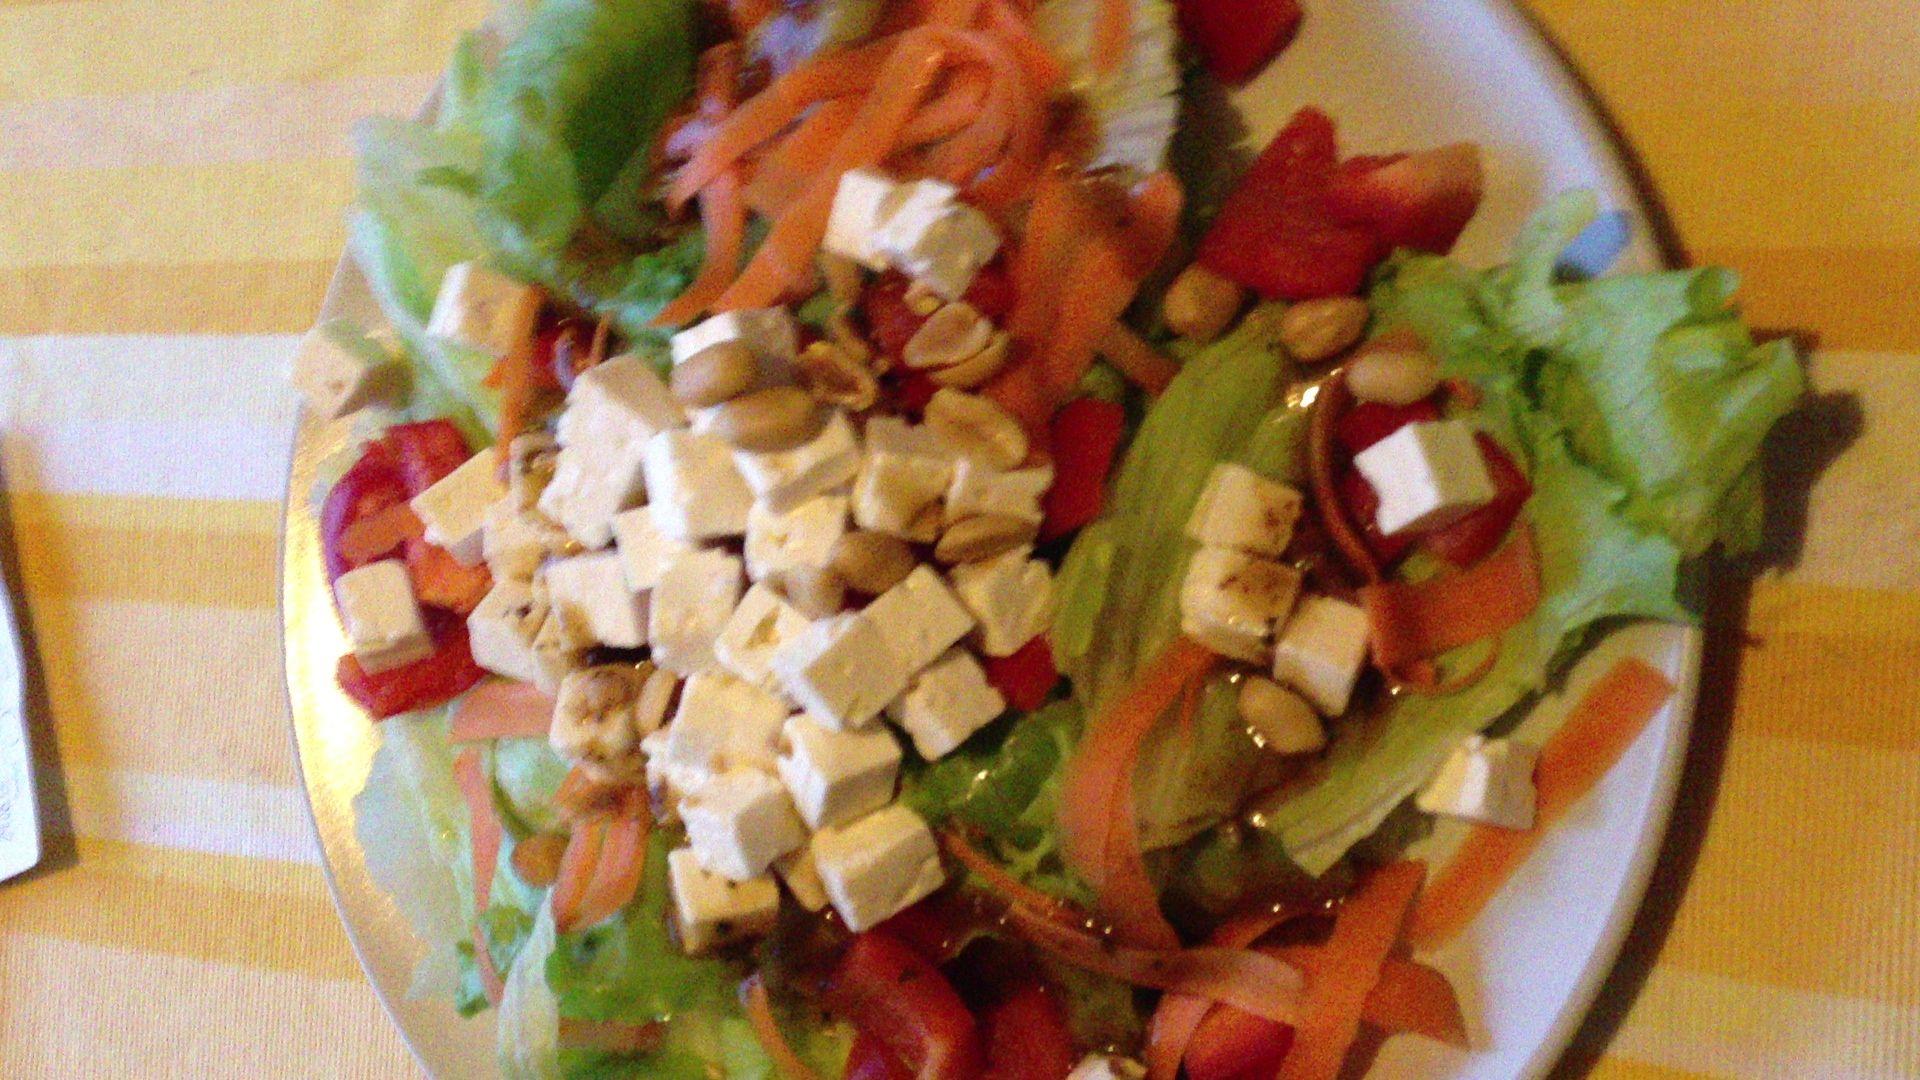 Feta cheese salad for dinner